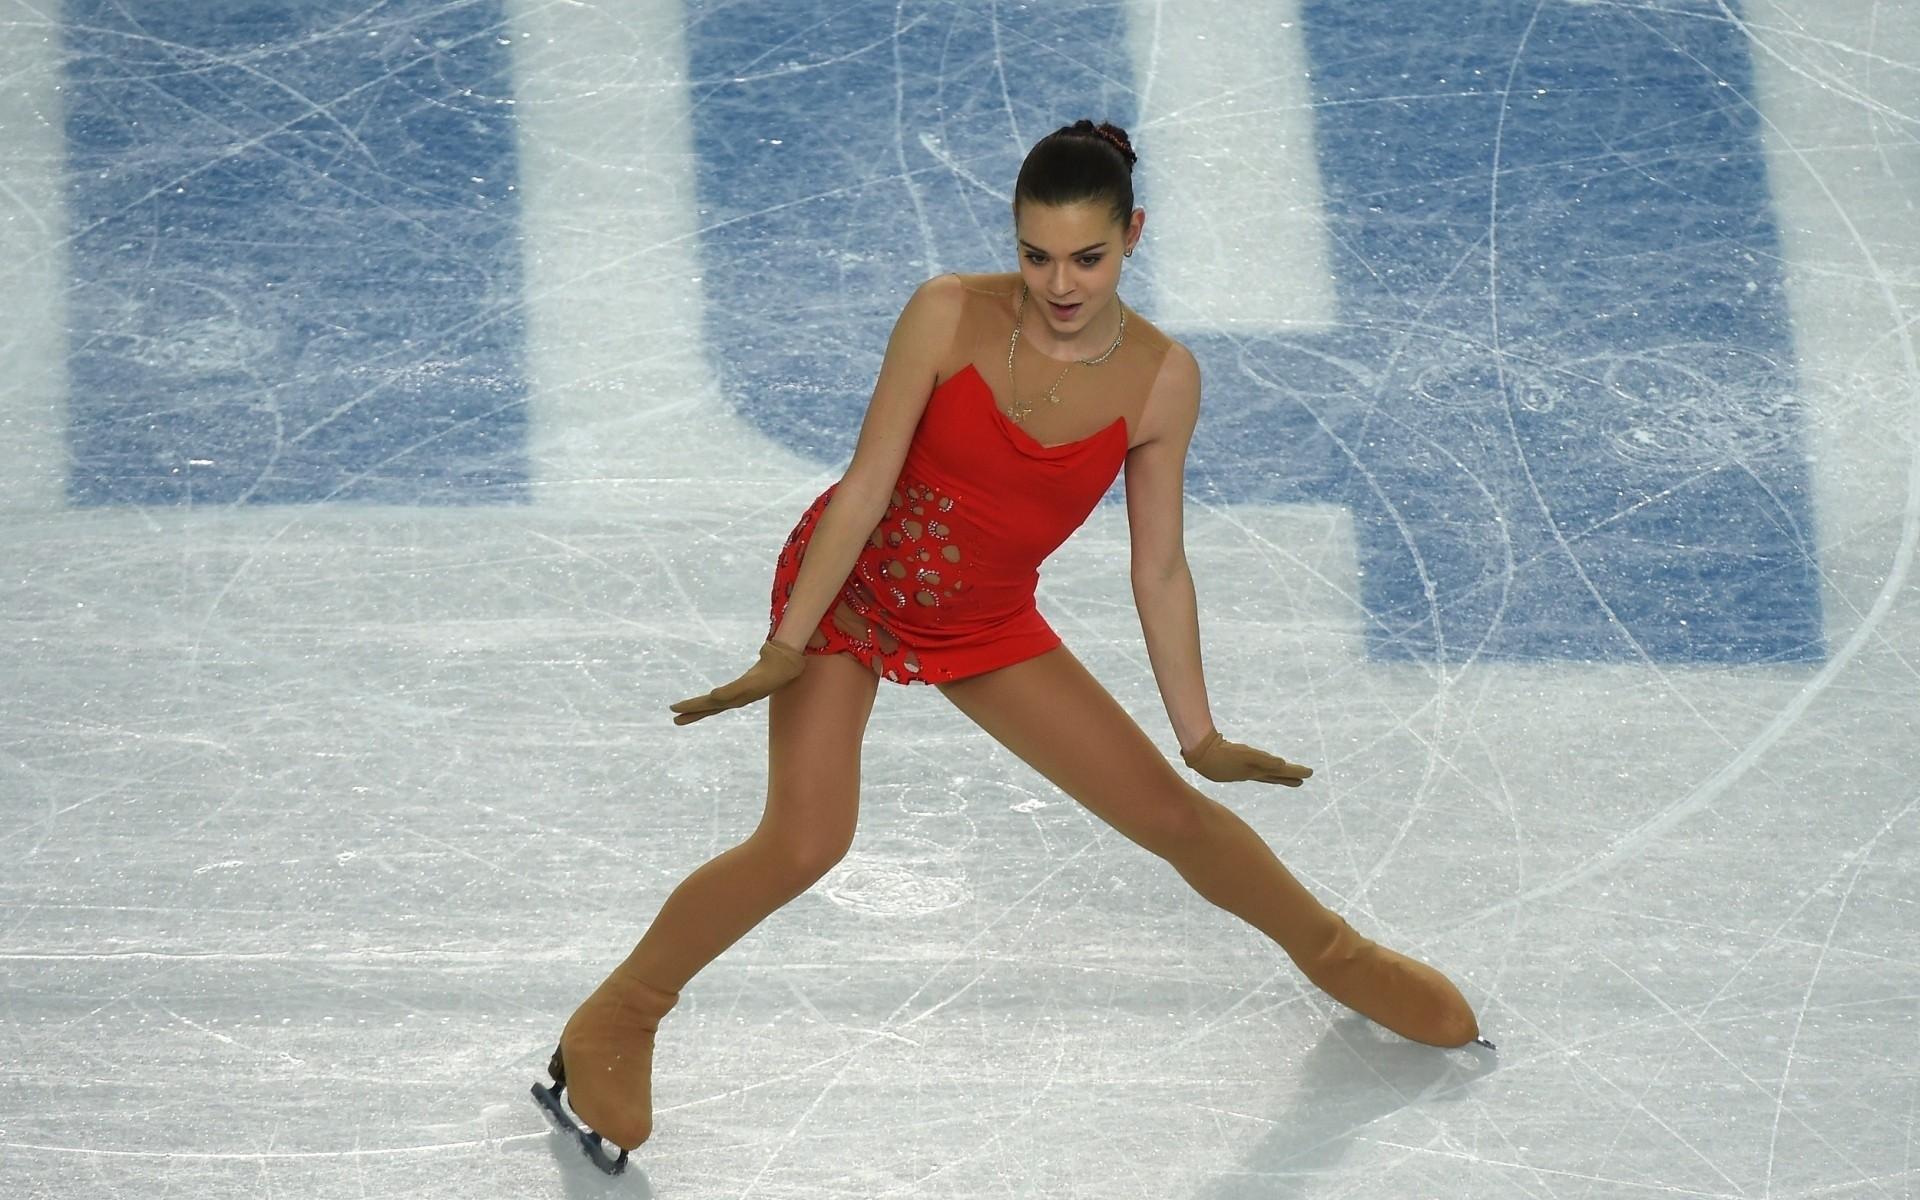 Res: 1920x1200, Adelina Sotnikova, figure skating, Sochi 2014, olympics